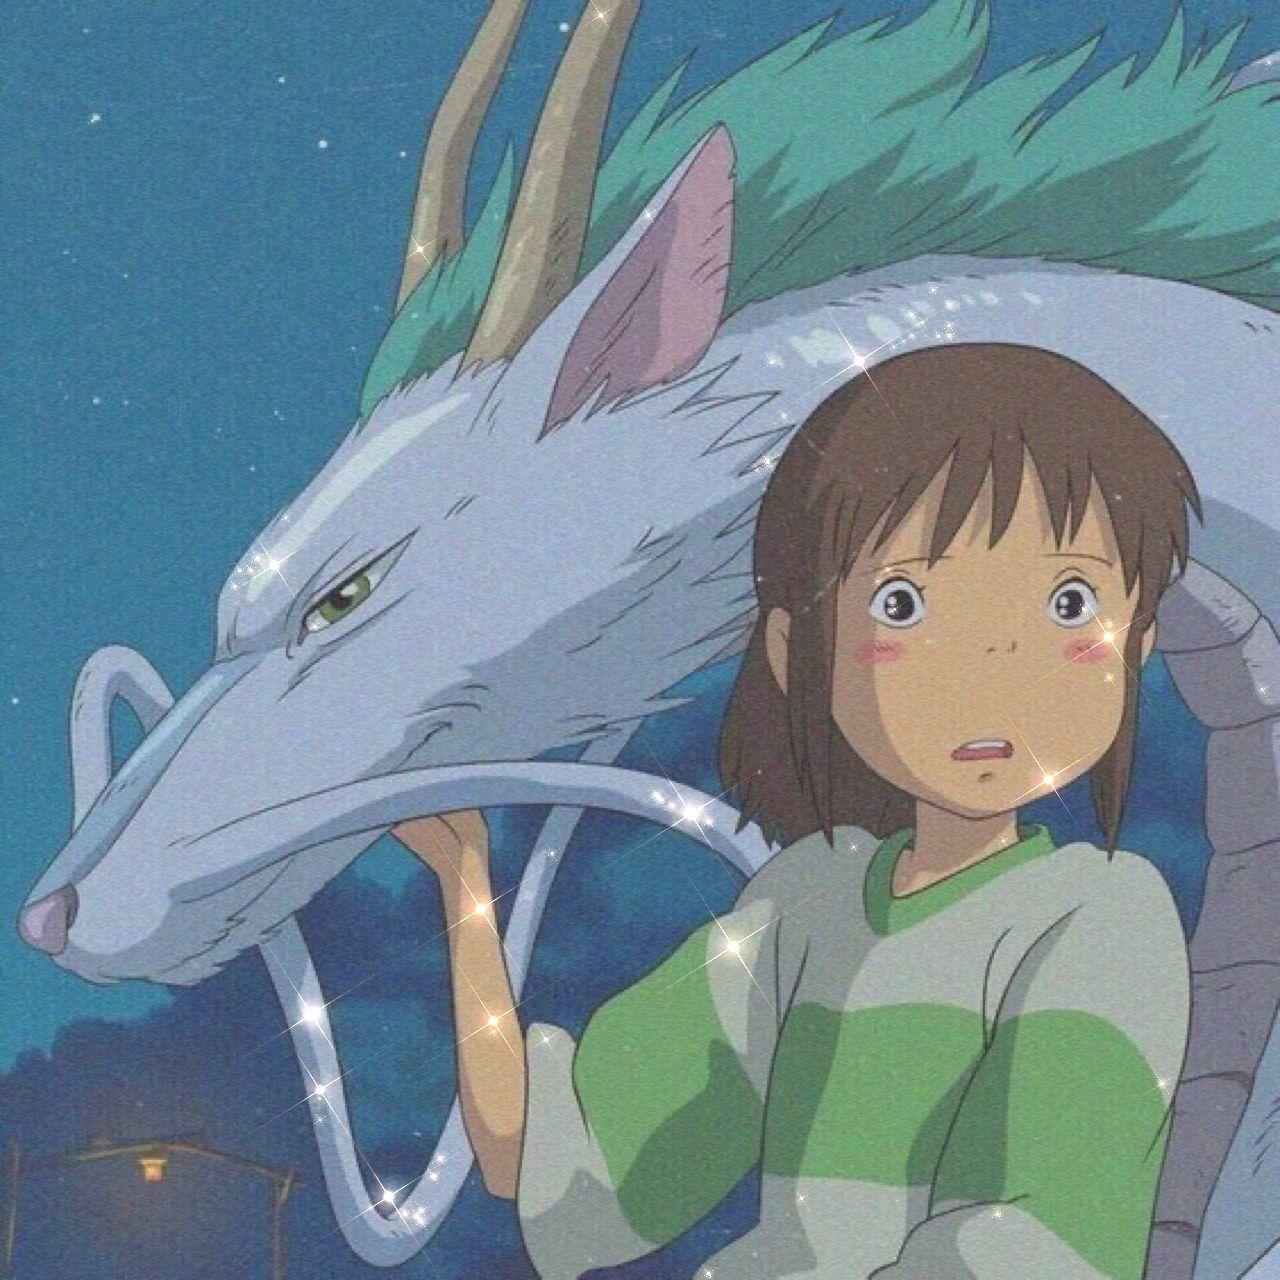 Icon Aesthetic Chichiro Spirited Away In 2020 Ghibli Artwork Ghibli Anime